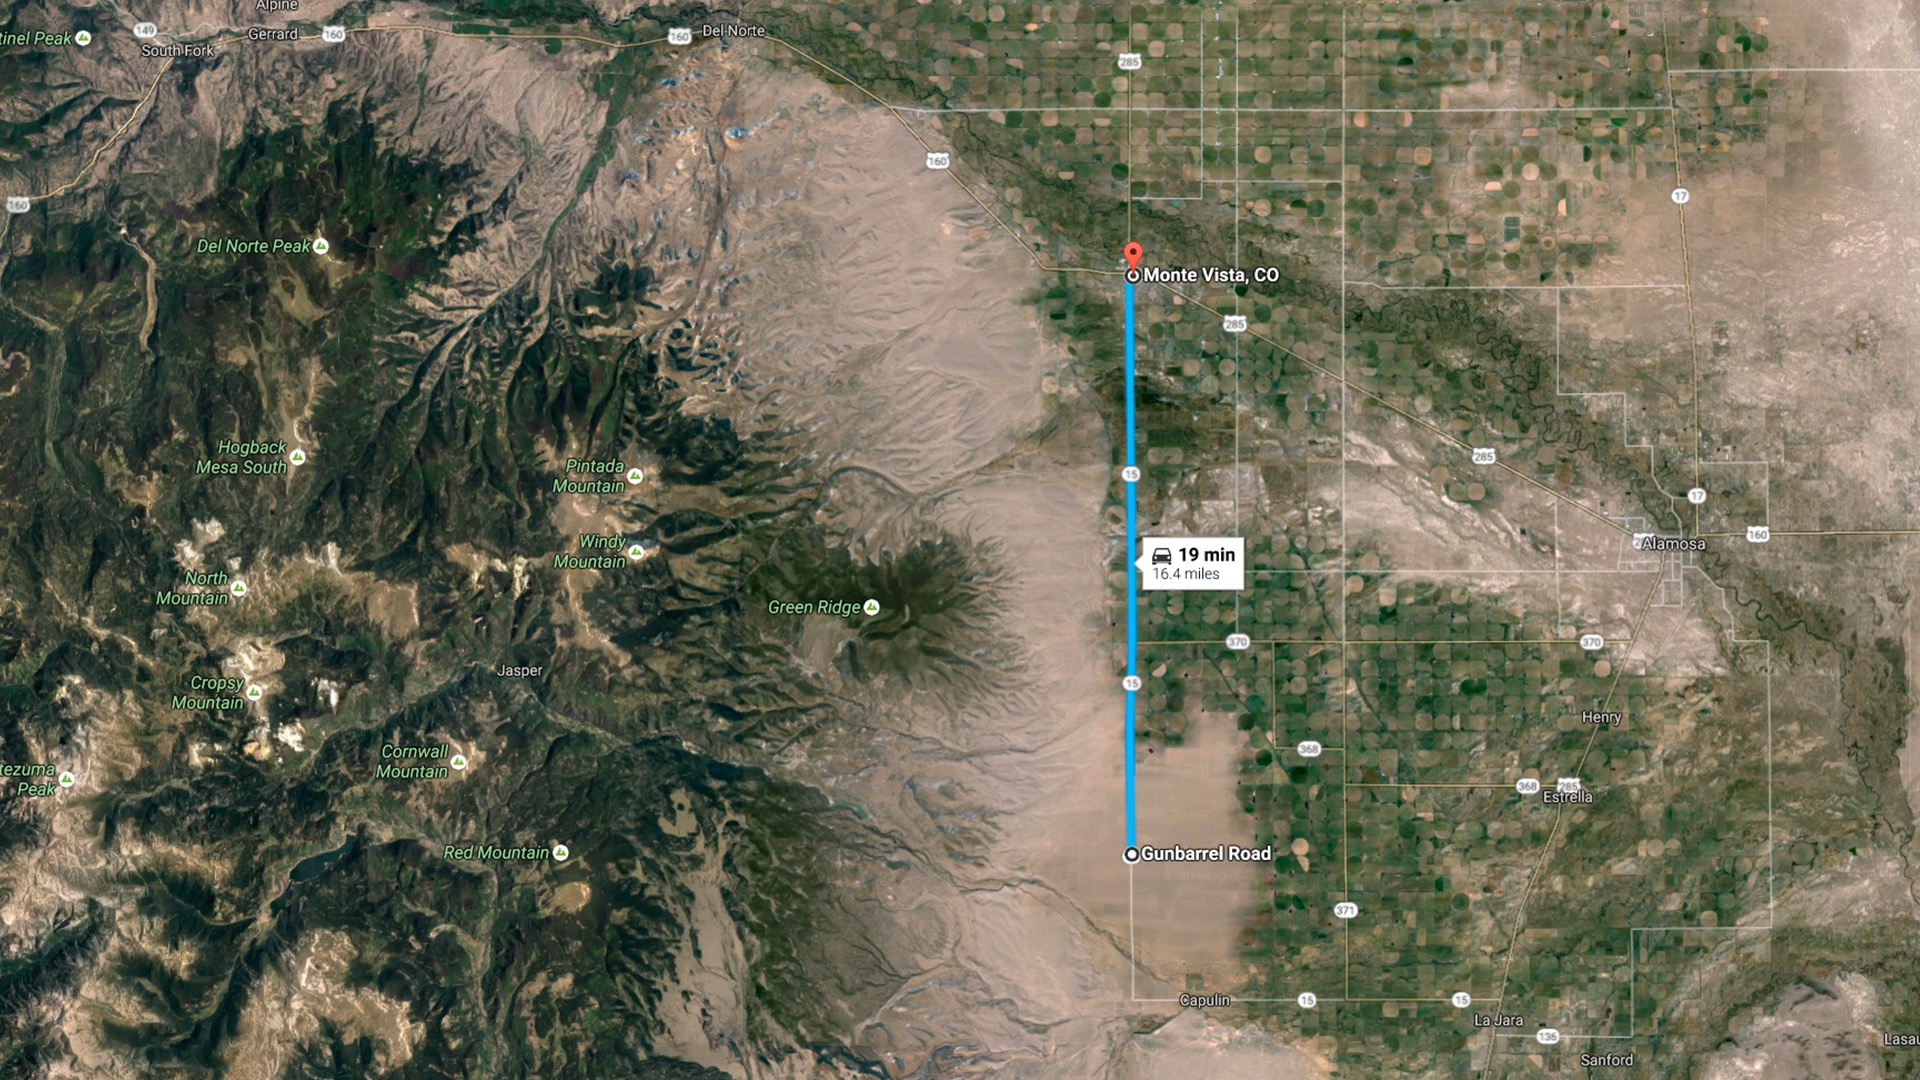 16 miles to Monte Vista